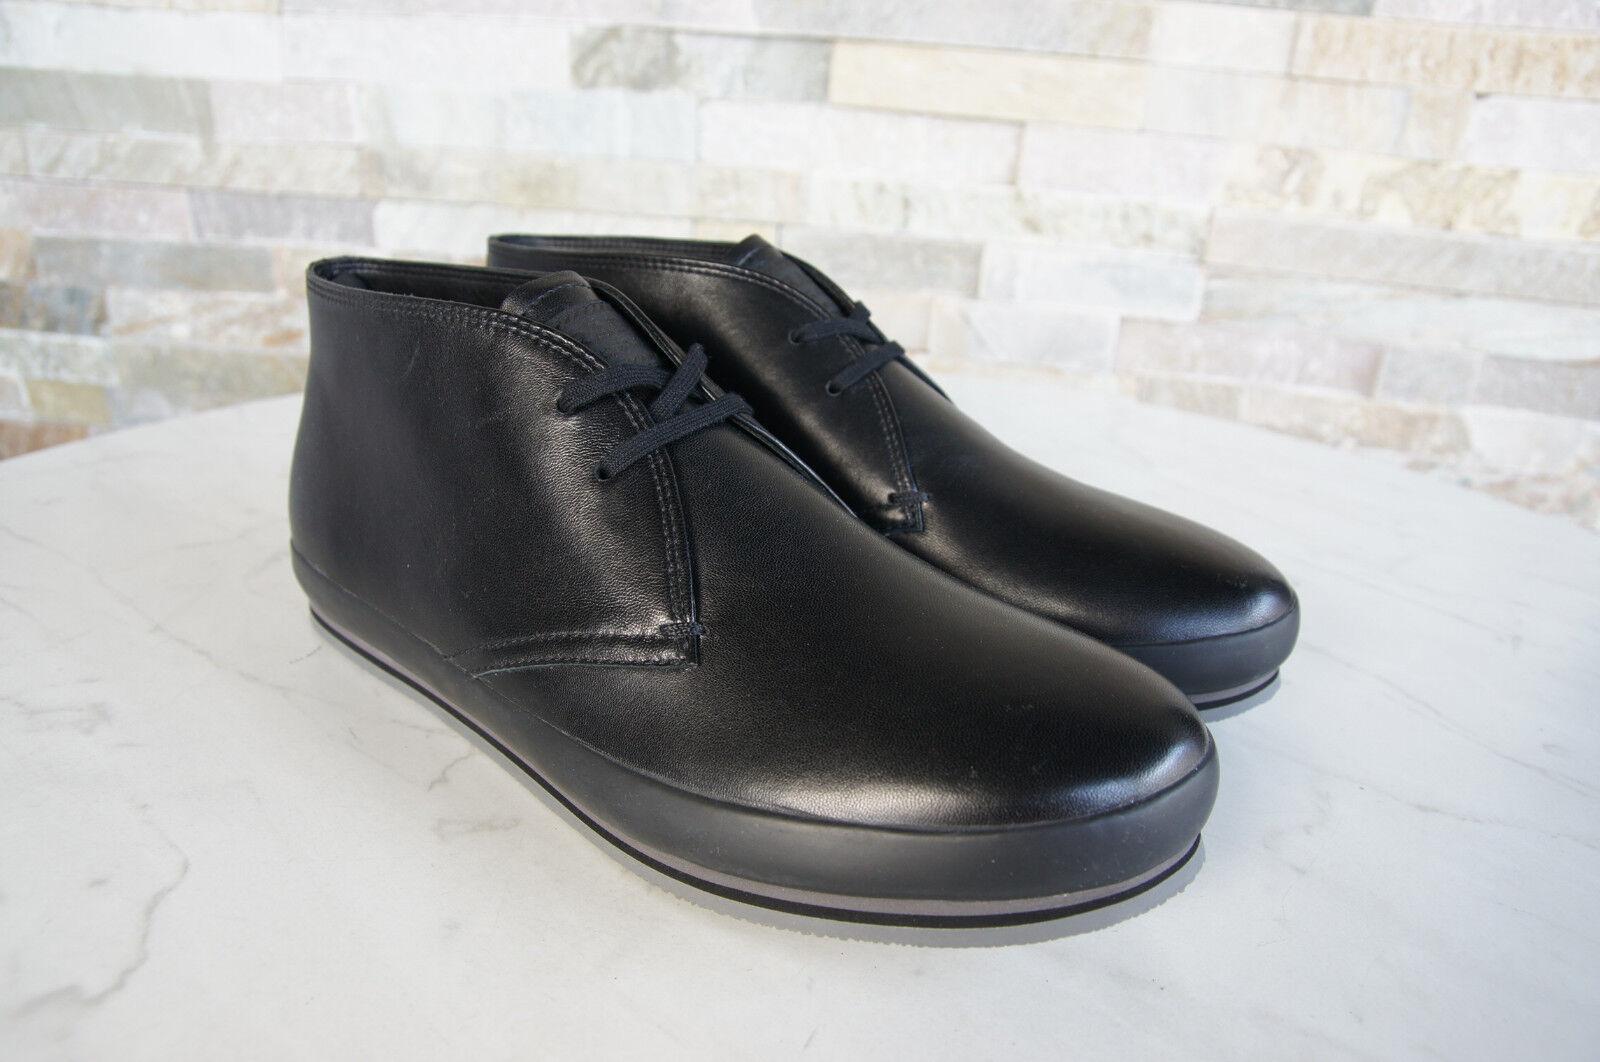 Prada 6,5 6,5 6,5  40,5 Halbschuhe Schnürschuhe Schuhe 4T2405 schwarz NEU ehem   8406be